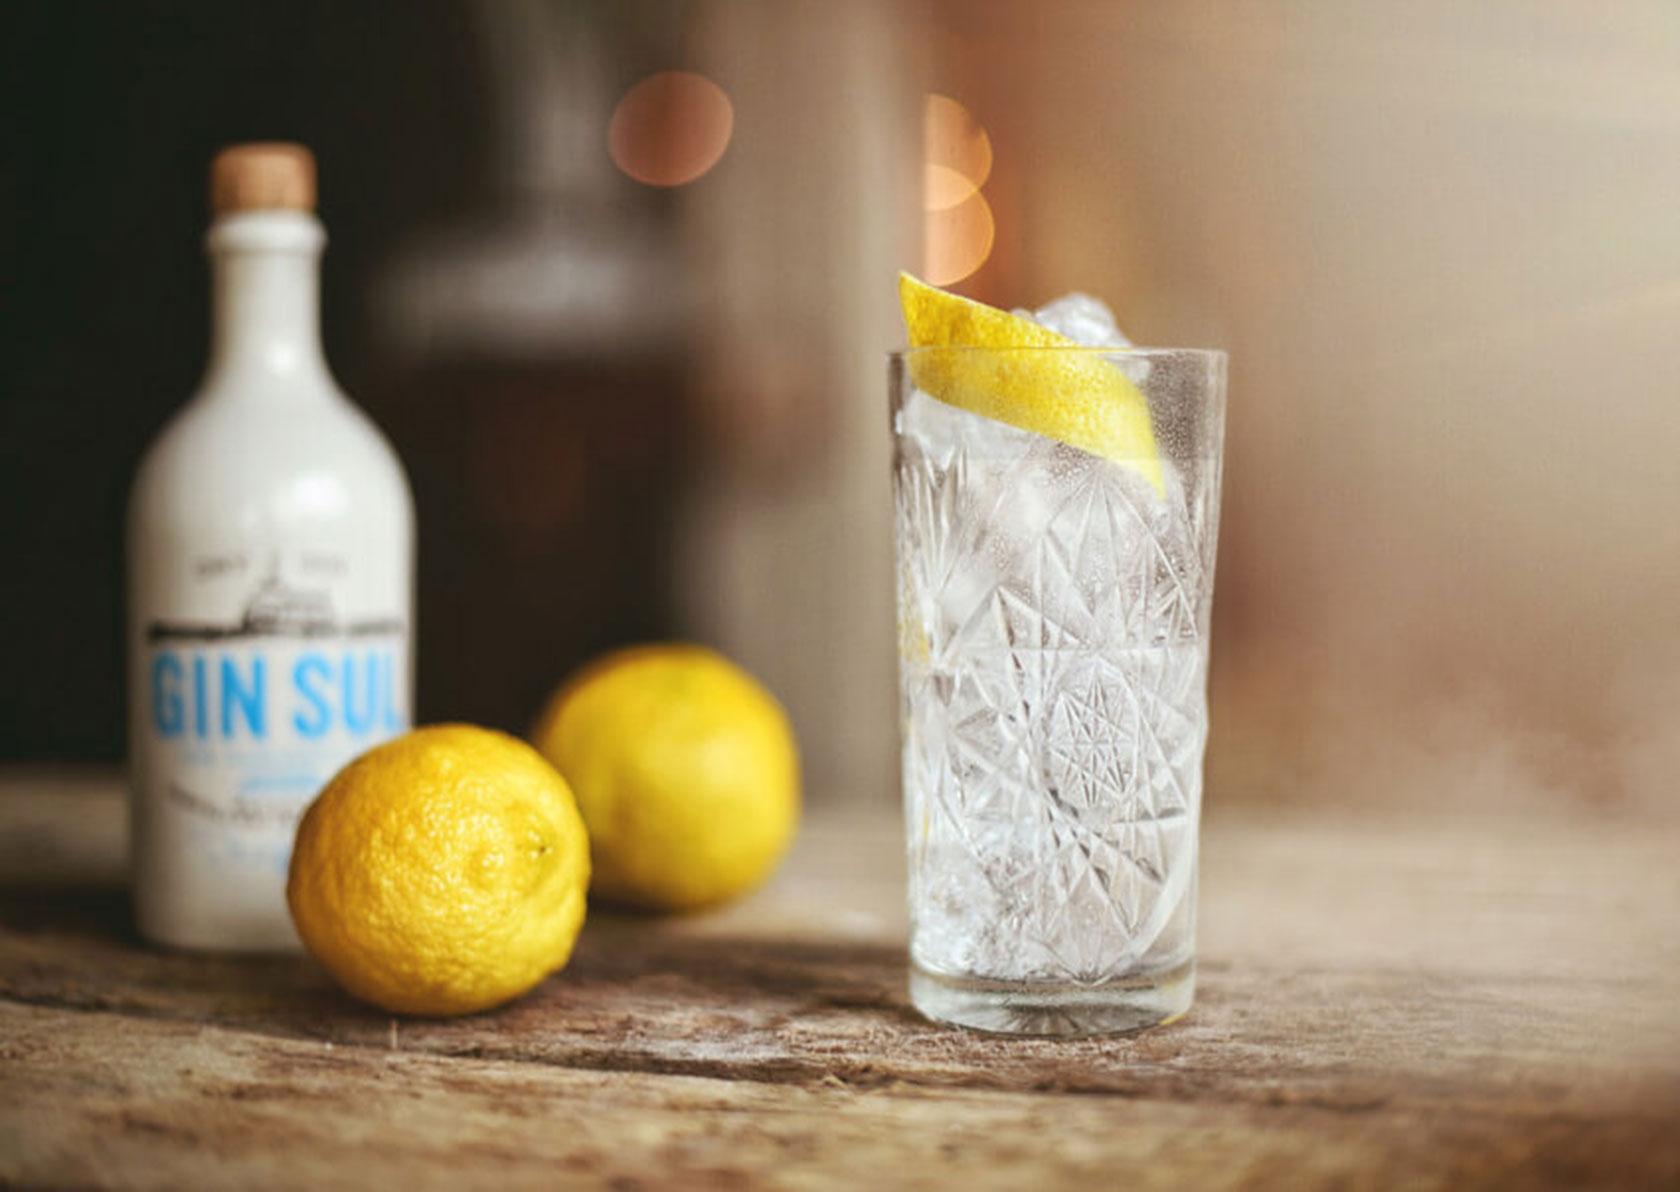 Gin Sul Hamburg